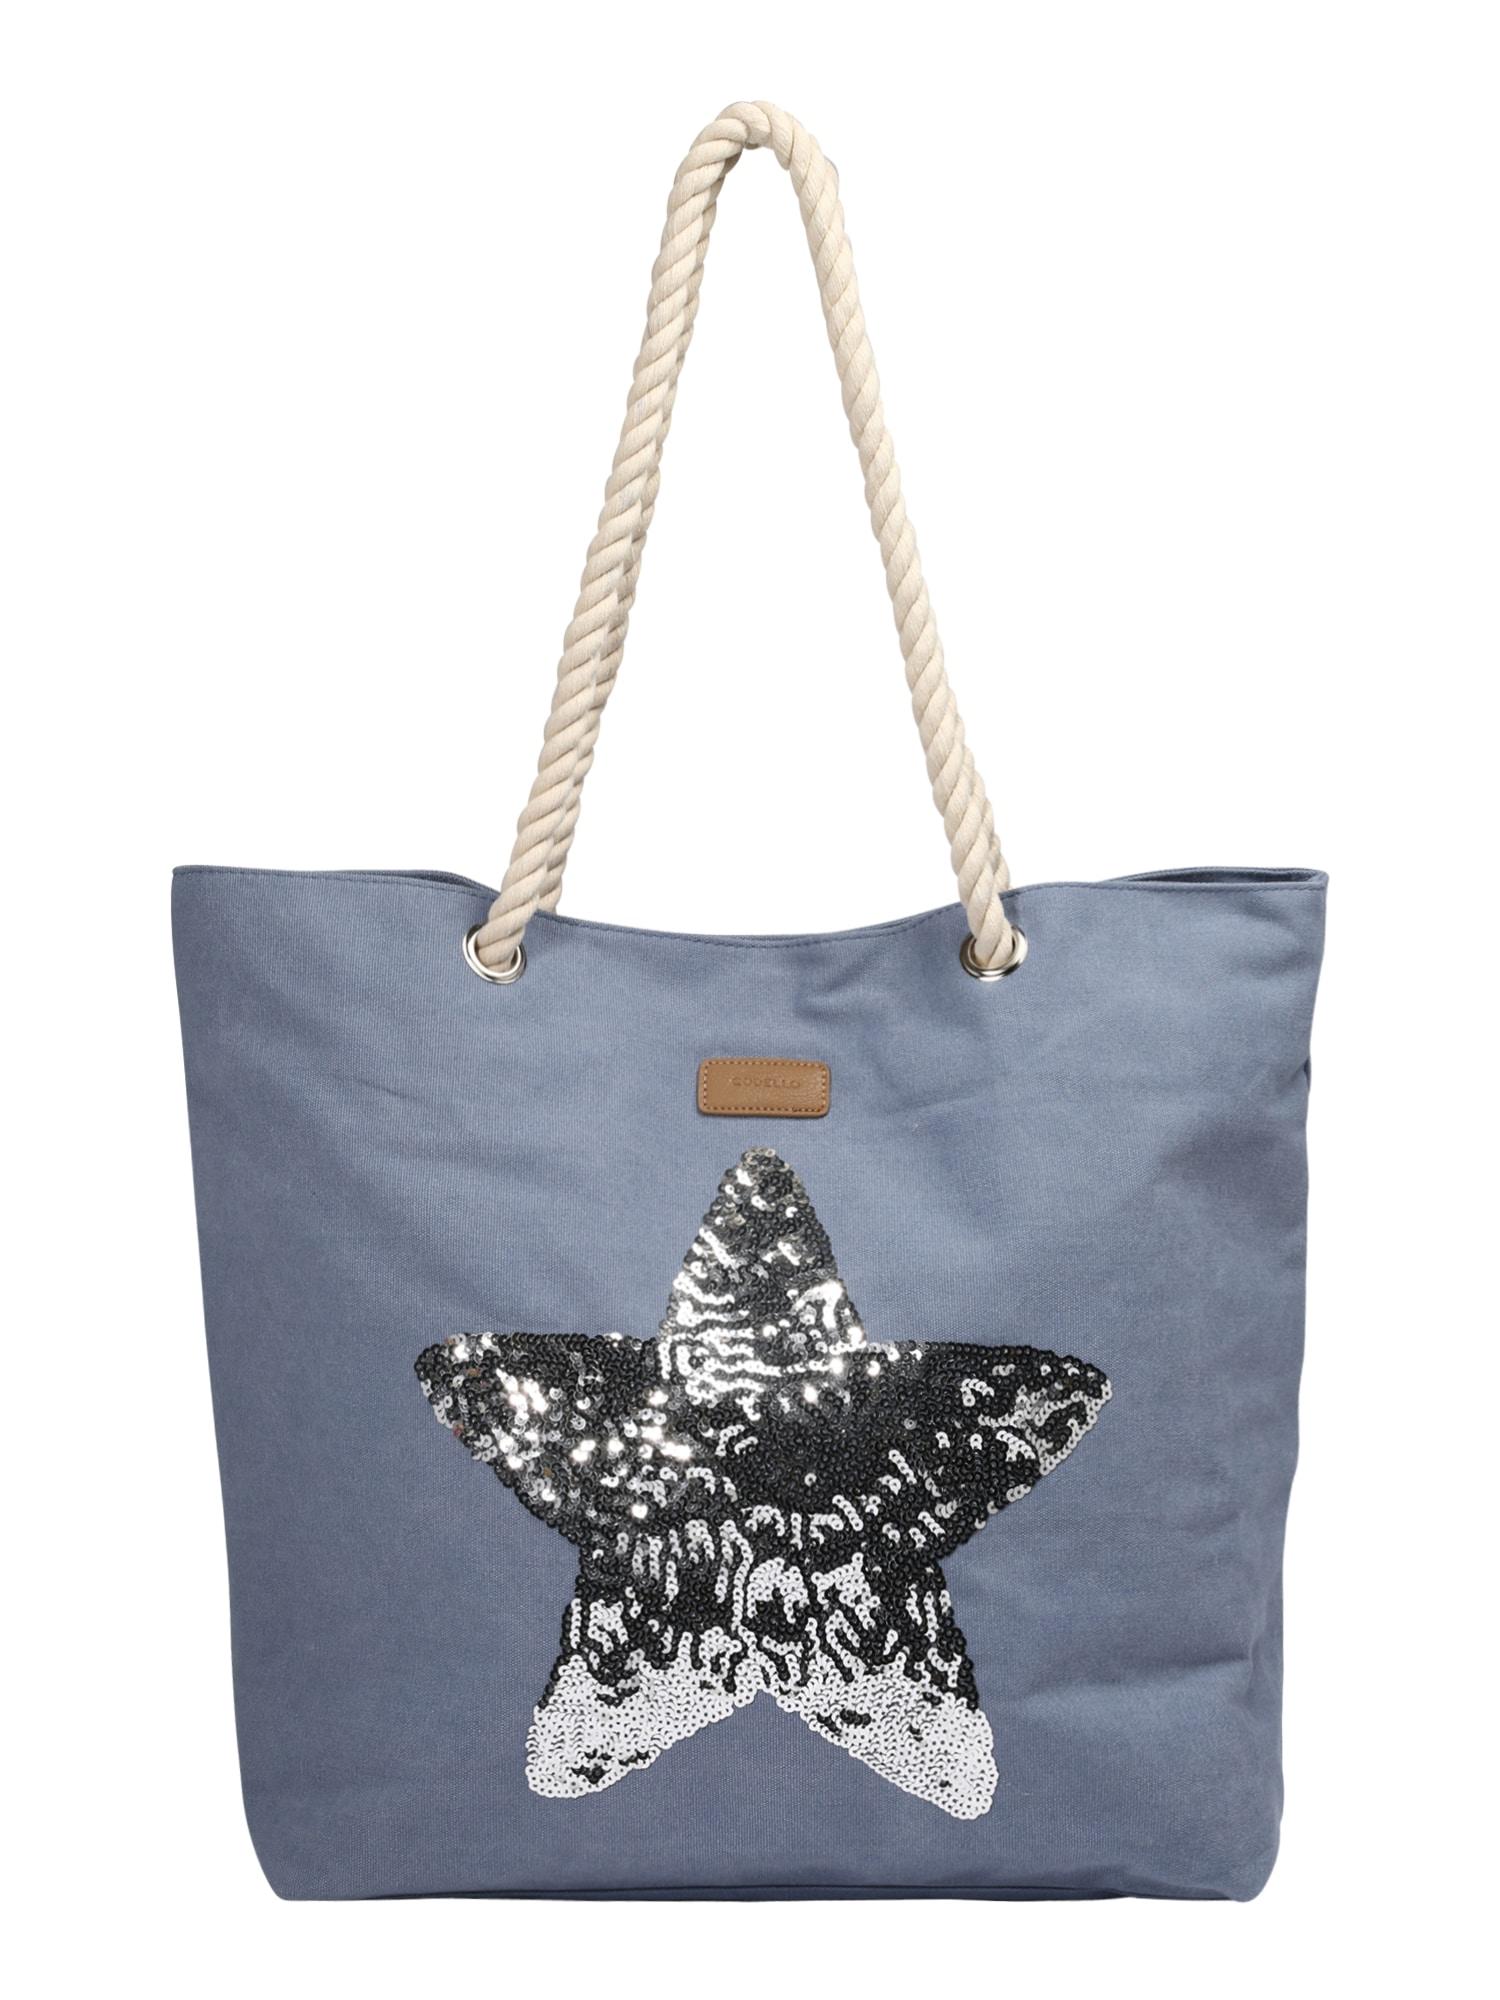 Nákupní taška chladná modrá stříbrná CODELLO